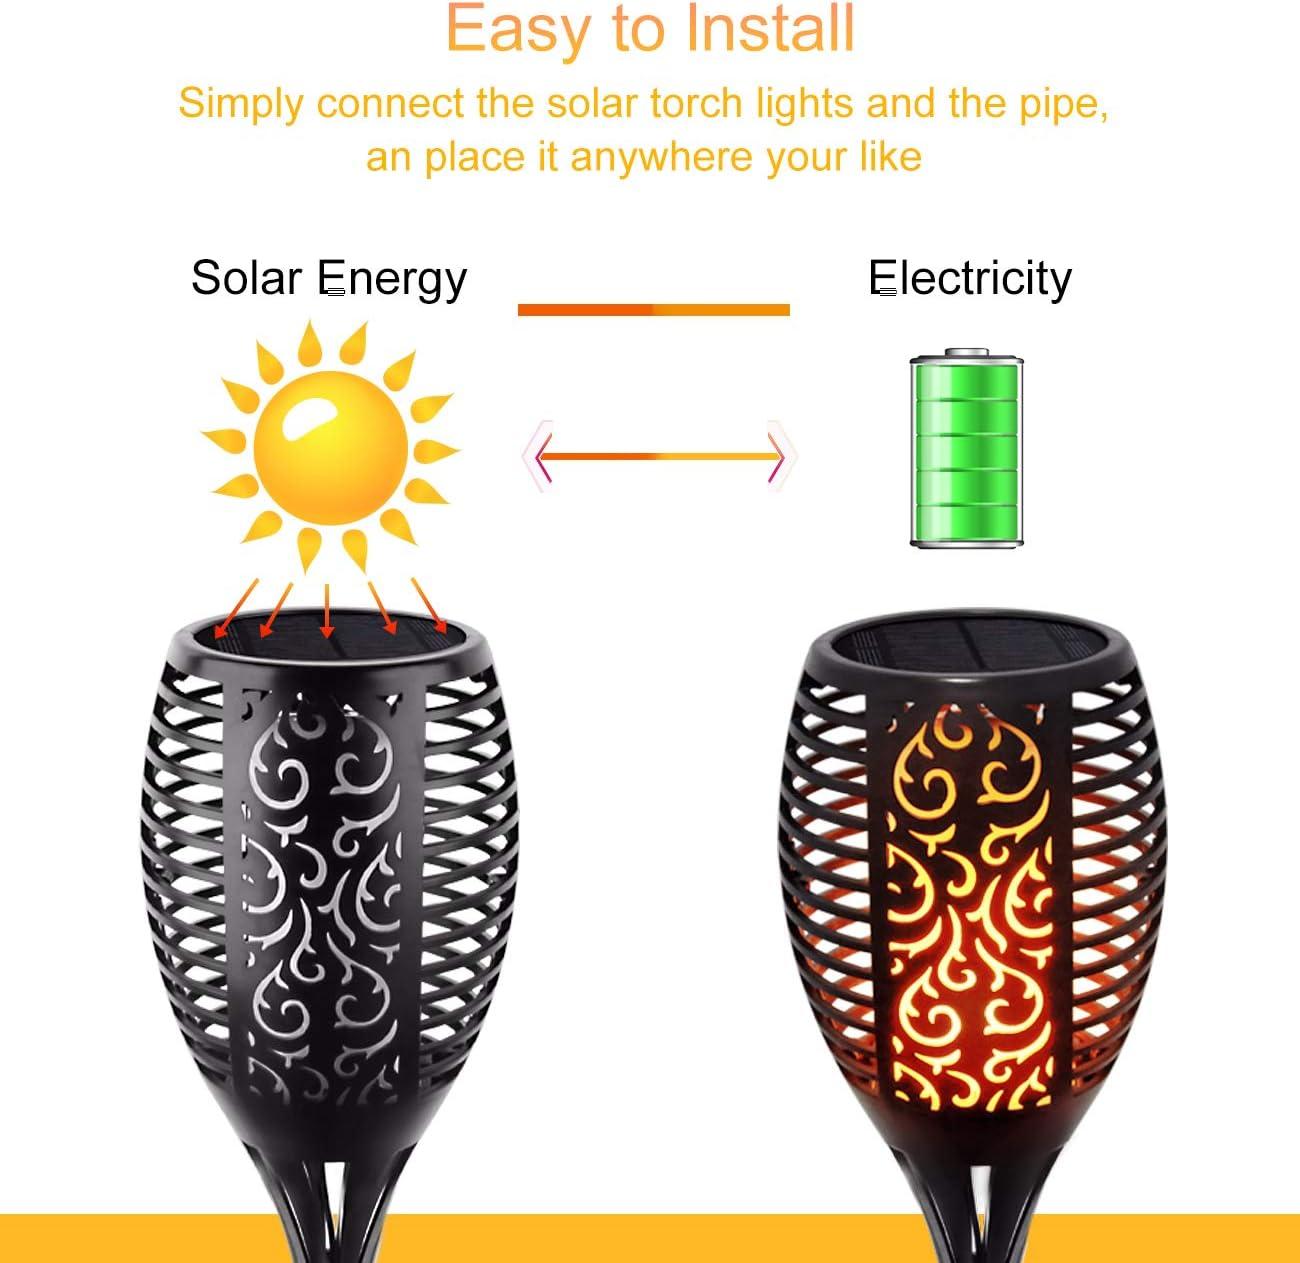 HAUSPROFI Solar Jard/ín Llamas antorchas 96 LED Solarleuchte jard/ín IP65 estanco Gartenleuchten Outdoor Solar Spotlight autom/ática de encendido//apagado 2 unidades Solar LED Solarlampe luz sensor